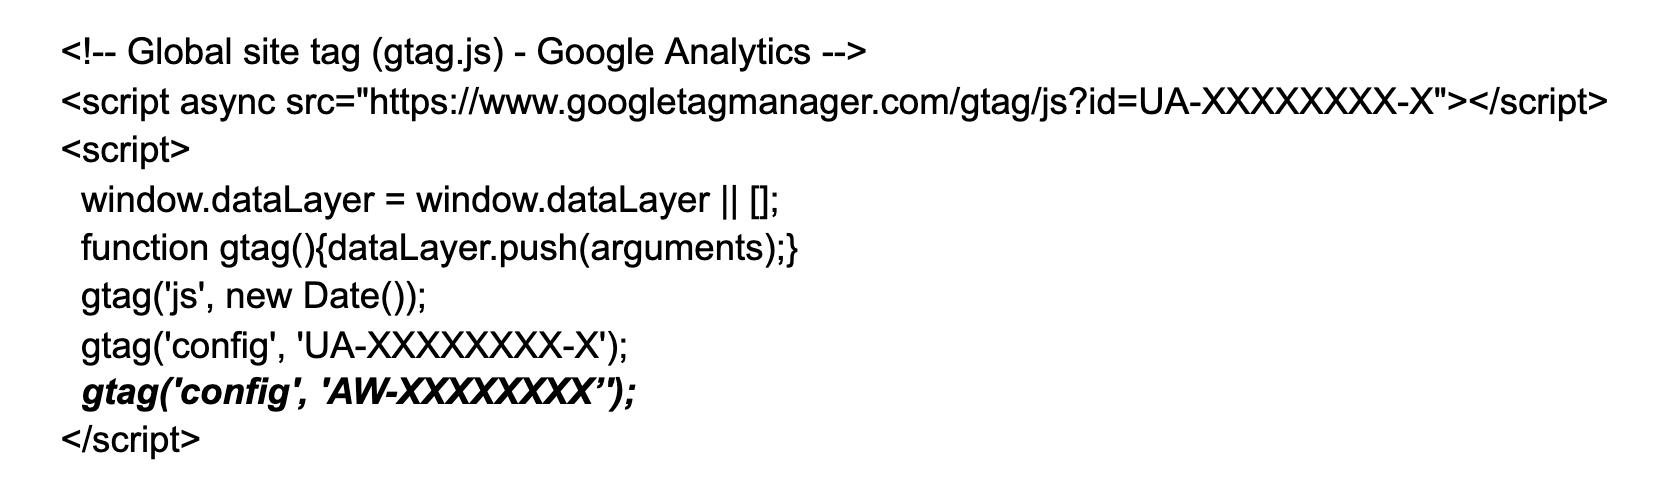 Mã Google Ads trong Google Analytics